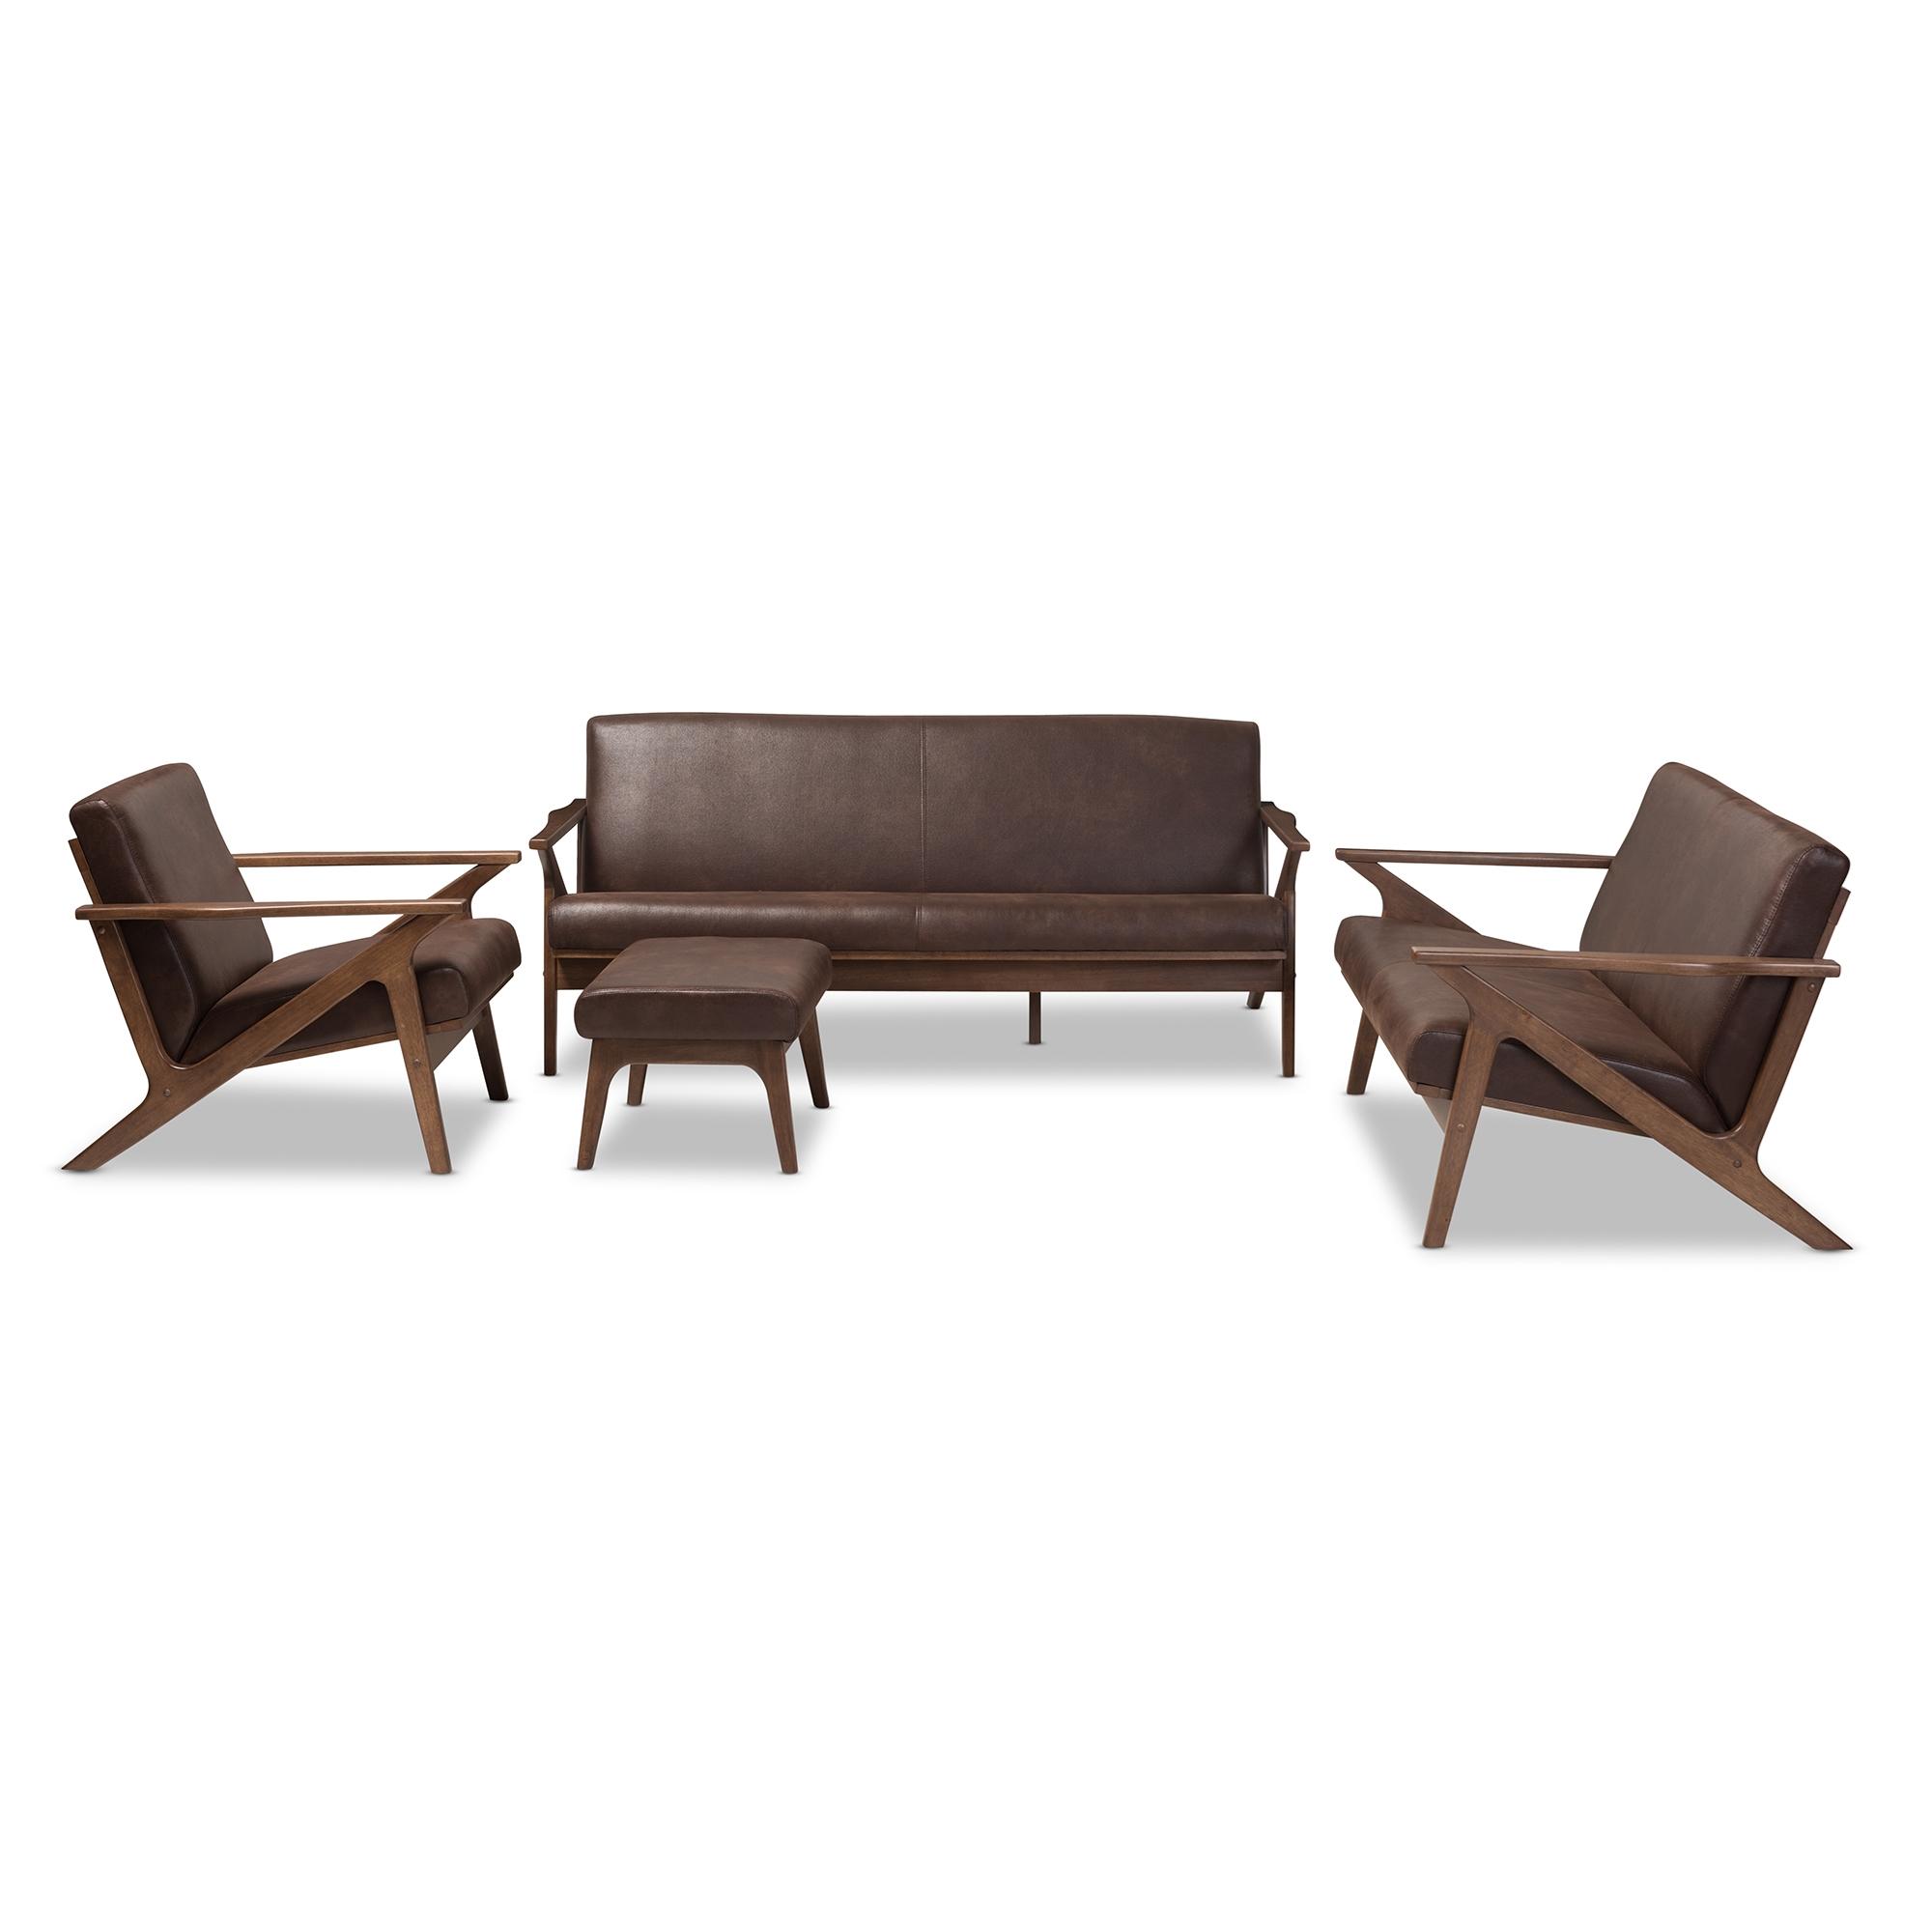 Baxton Studio Bianca Mid Century Modern Walnut Wood Dark Brown Distressed Faux Leather Livingroom Sofa Set